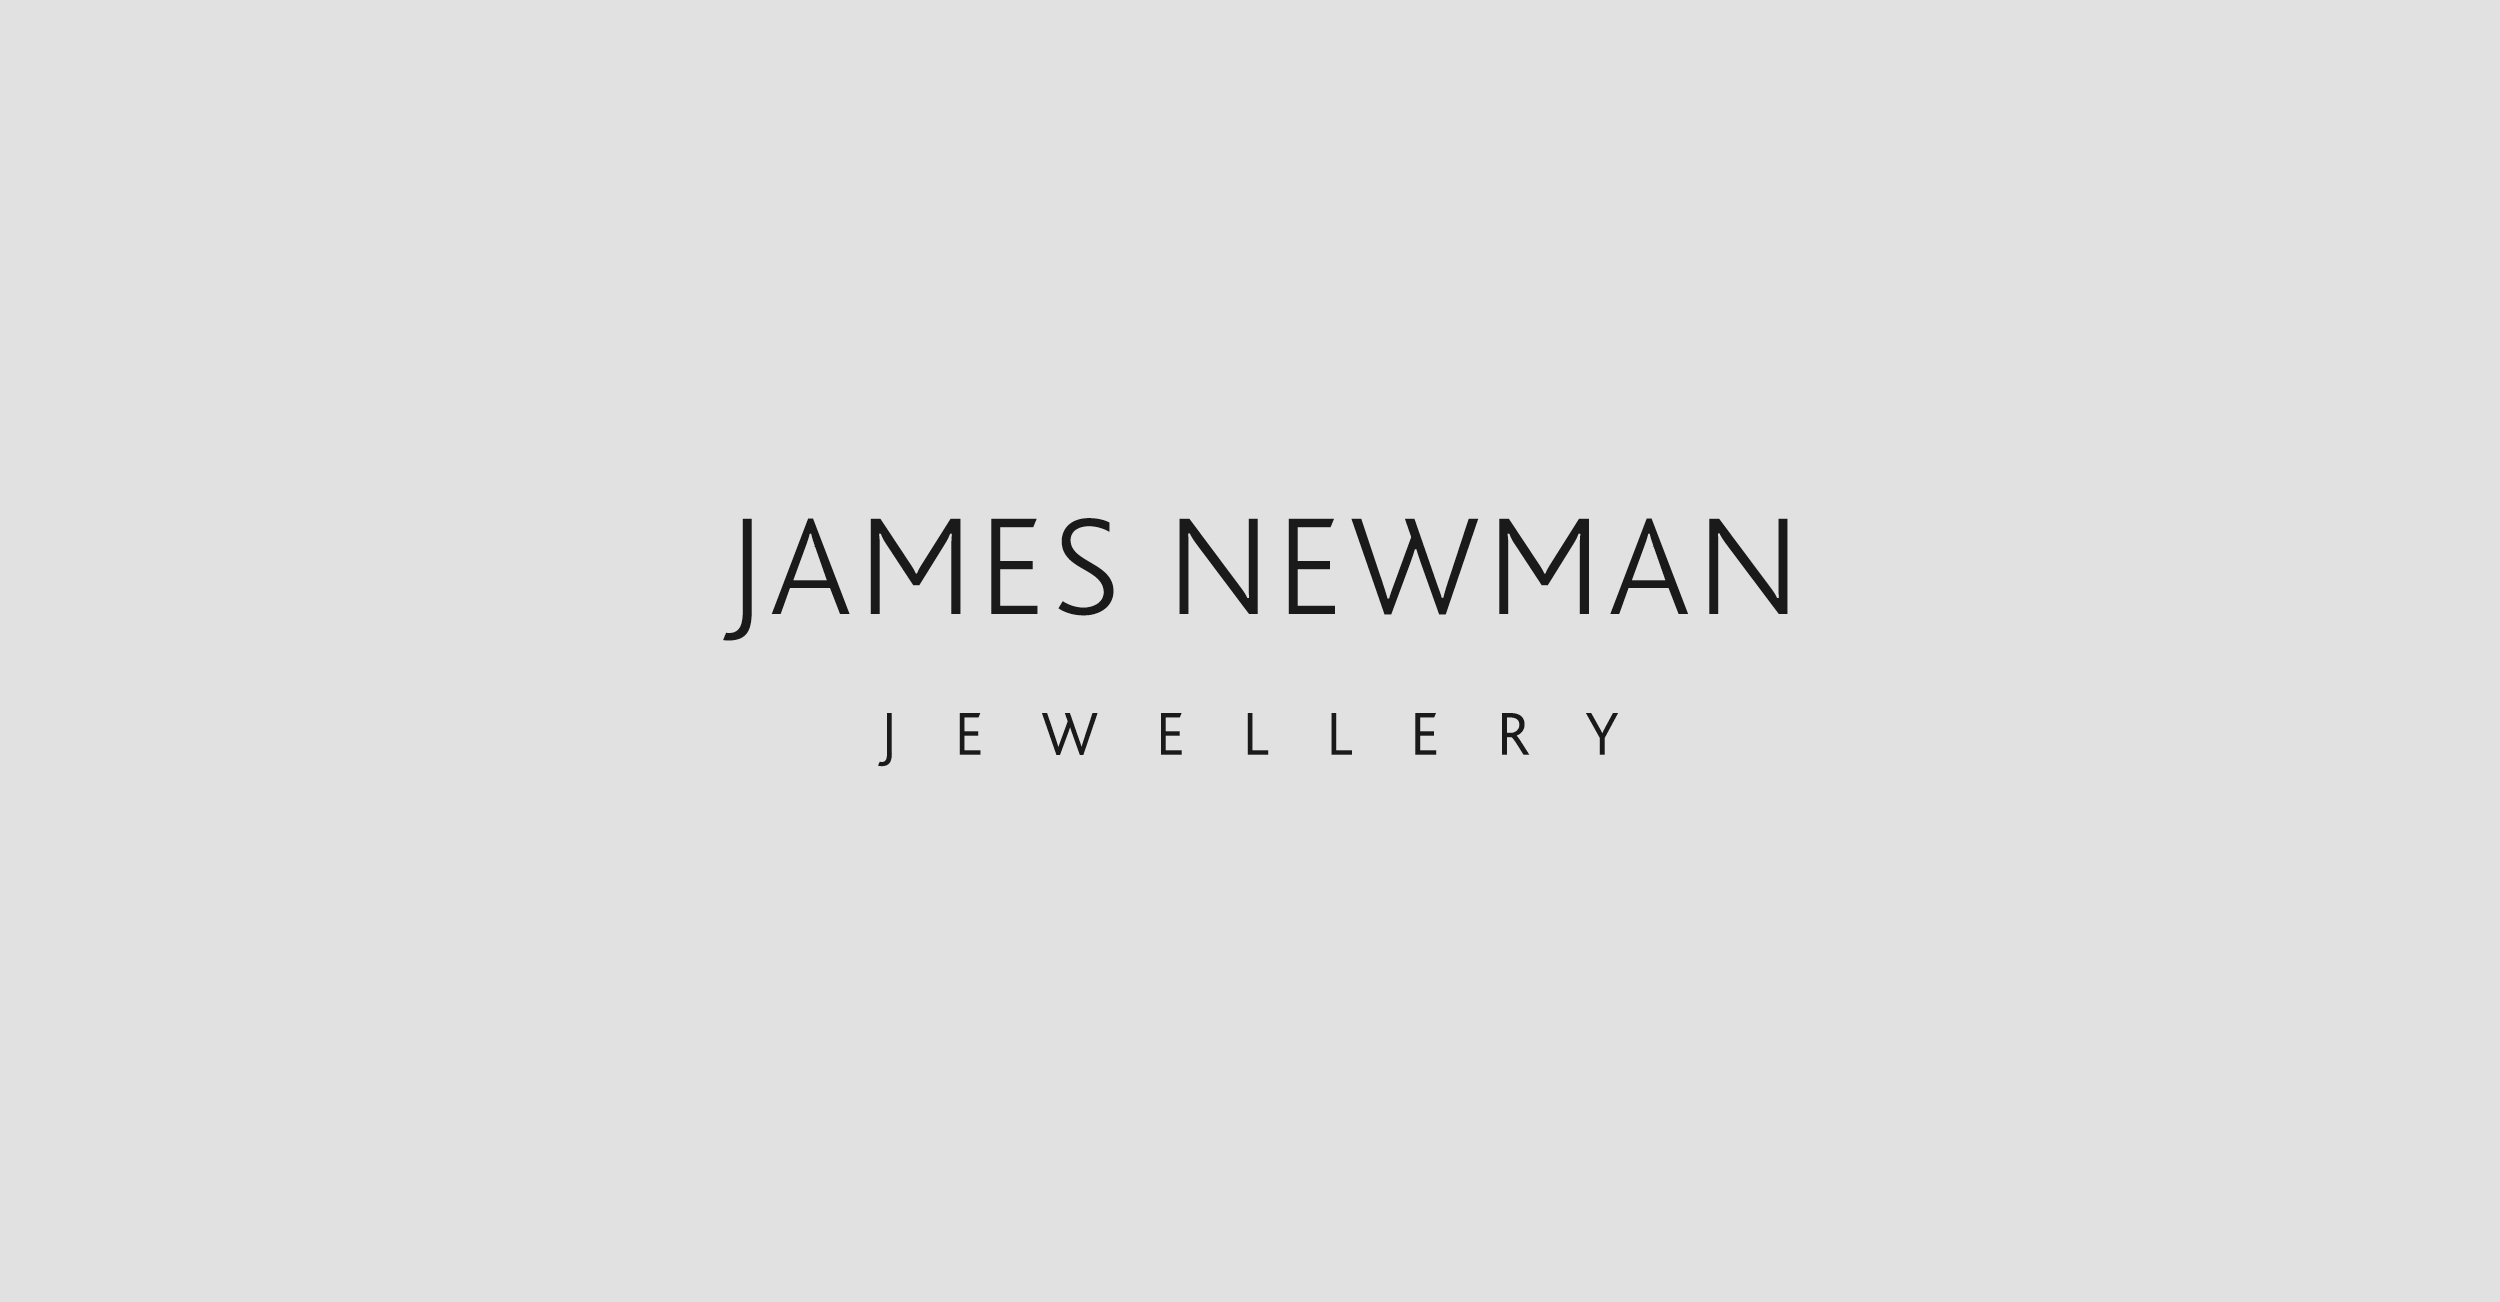 James Newman Jewellery - Identity